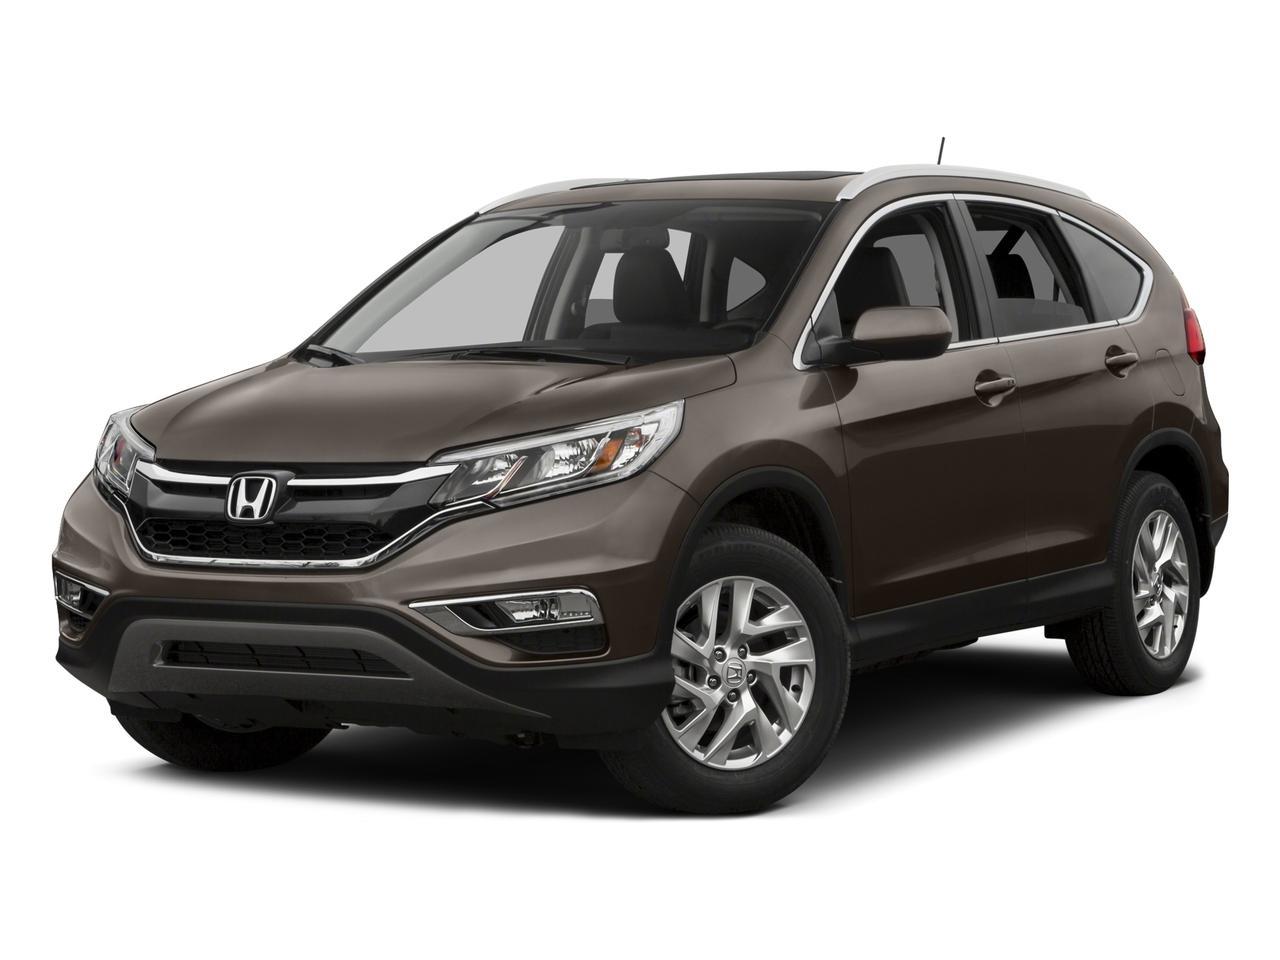 2015 Honda CR-V Vehicle Photo in GREENSBORO, NC 27405-6904